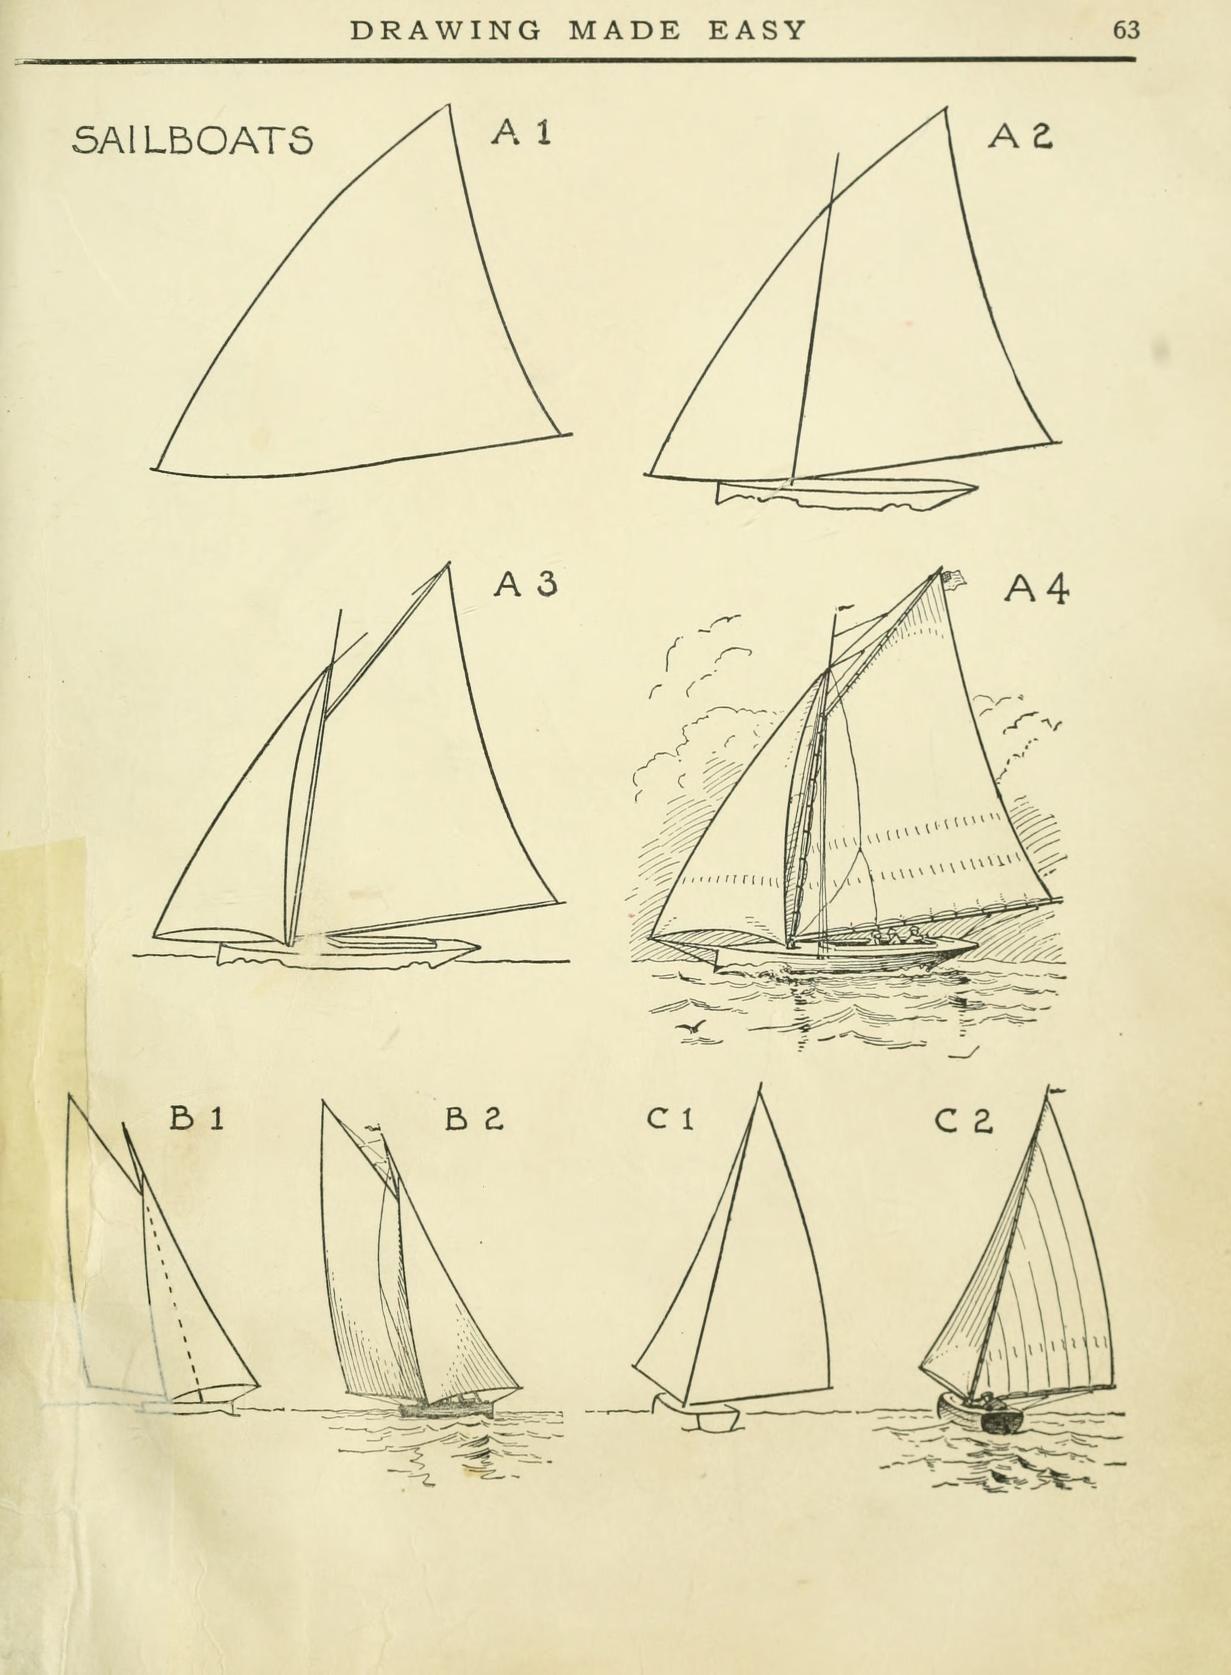 Sailboat | Maren\'s Cider Board | Pinterest | Dibujo, Dibujar y Veleros